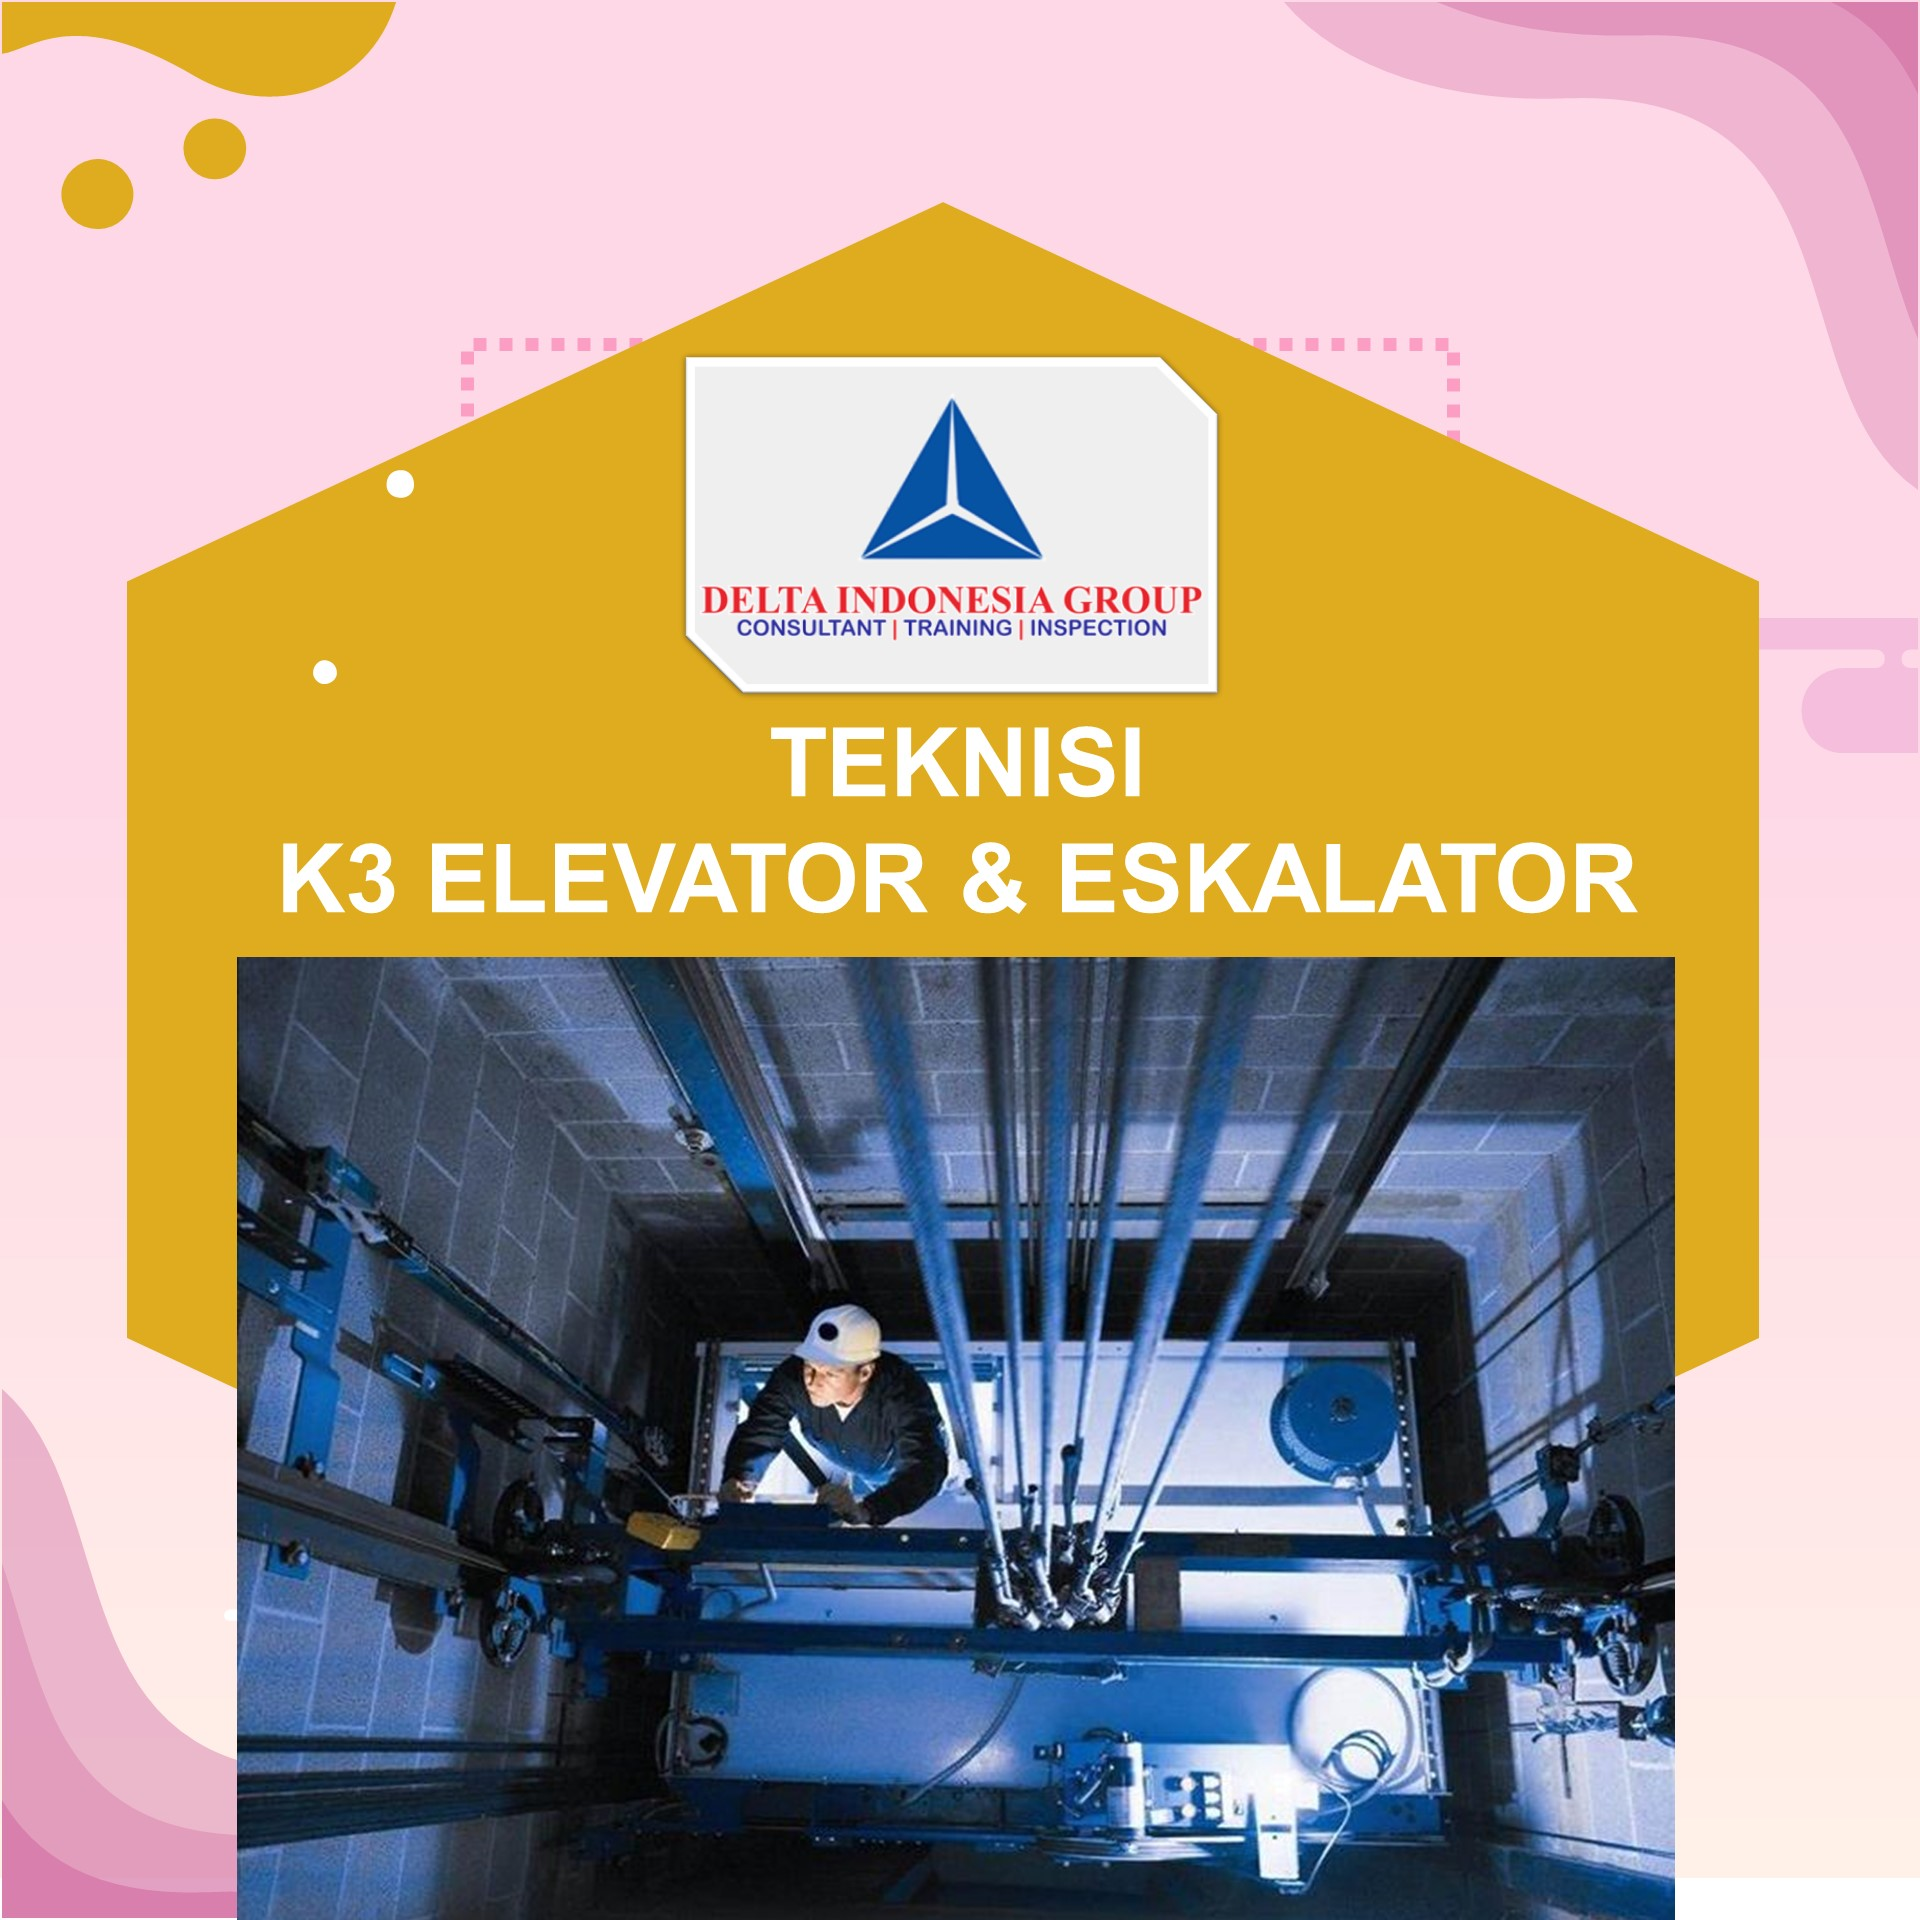 TEKNISI K3 ELEVATOR ESKALATOR